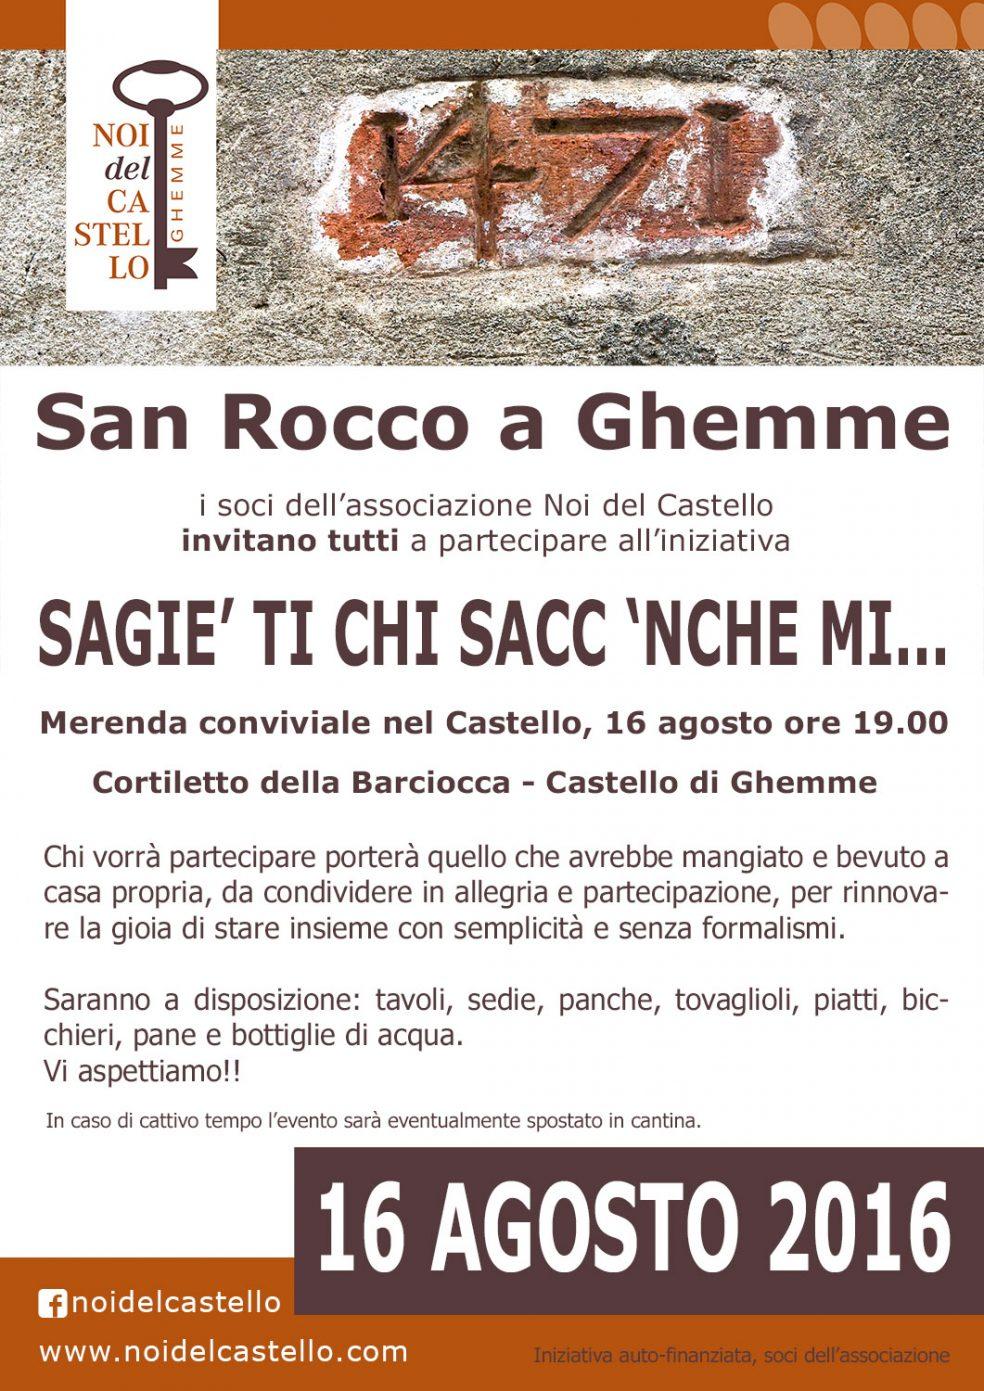 san rocco sagie ti 2016 1500 castello ghemme